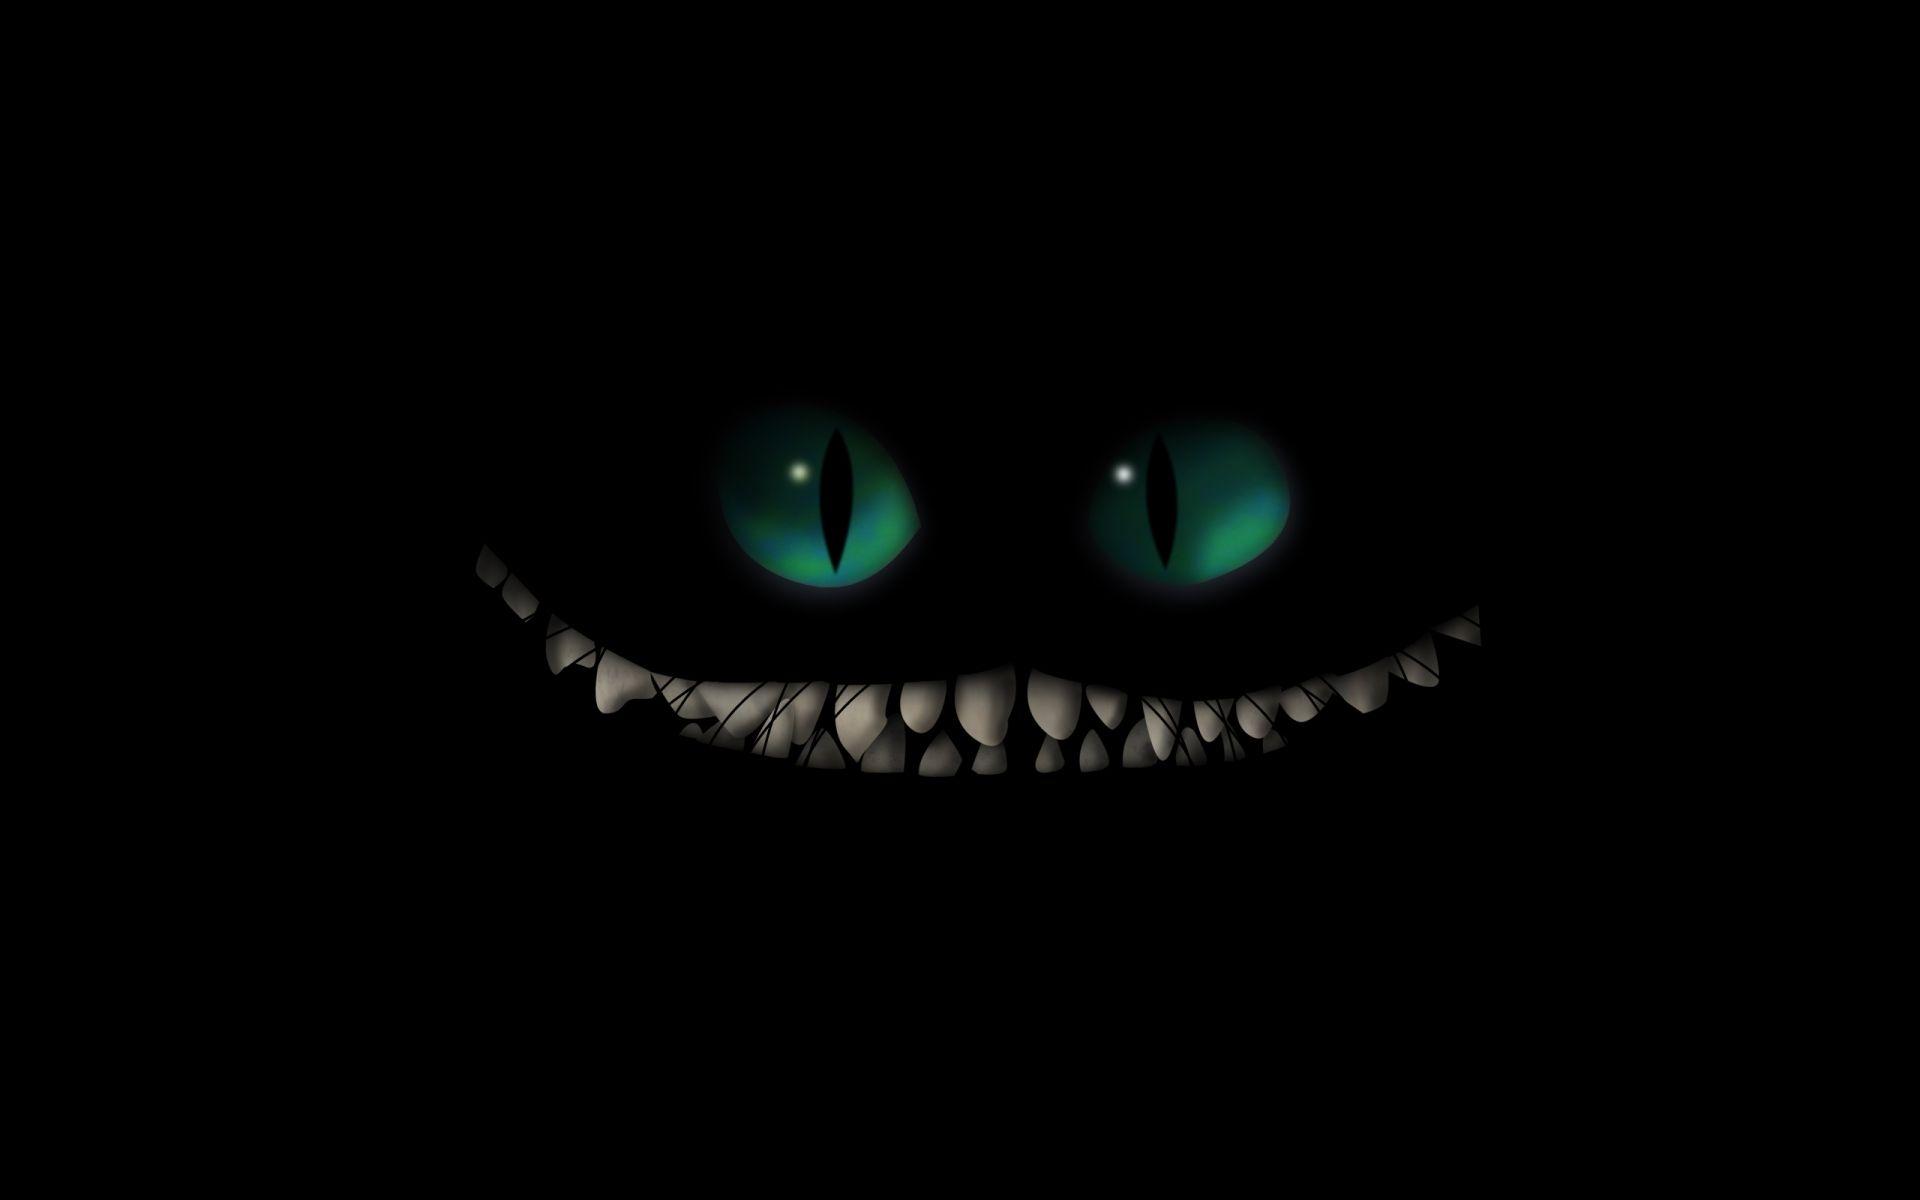 Dark Monster Creature Fangs Evil Scary Creepy Spooky Halloween Wallpaper 1920x1200 28141 Wallpaperu Cheshire Cat Wallpaper Scary Wallpaper Eyes Wallpaper